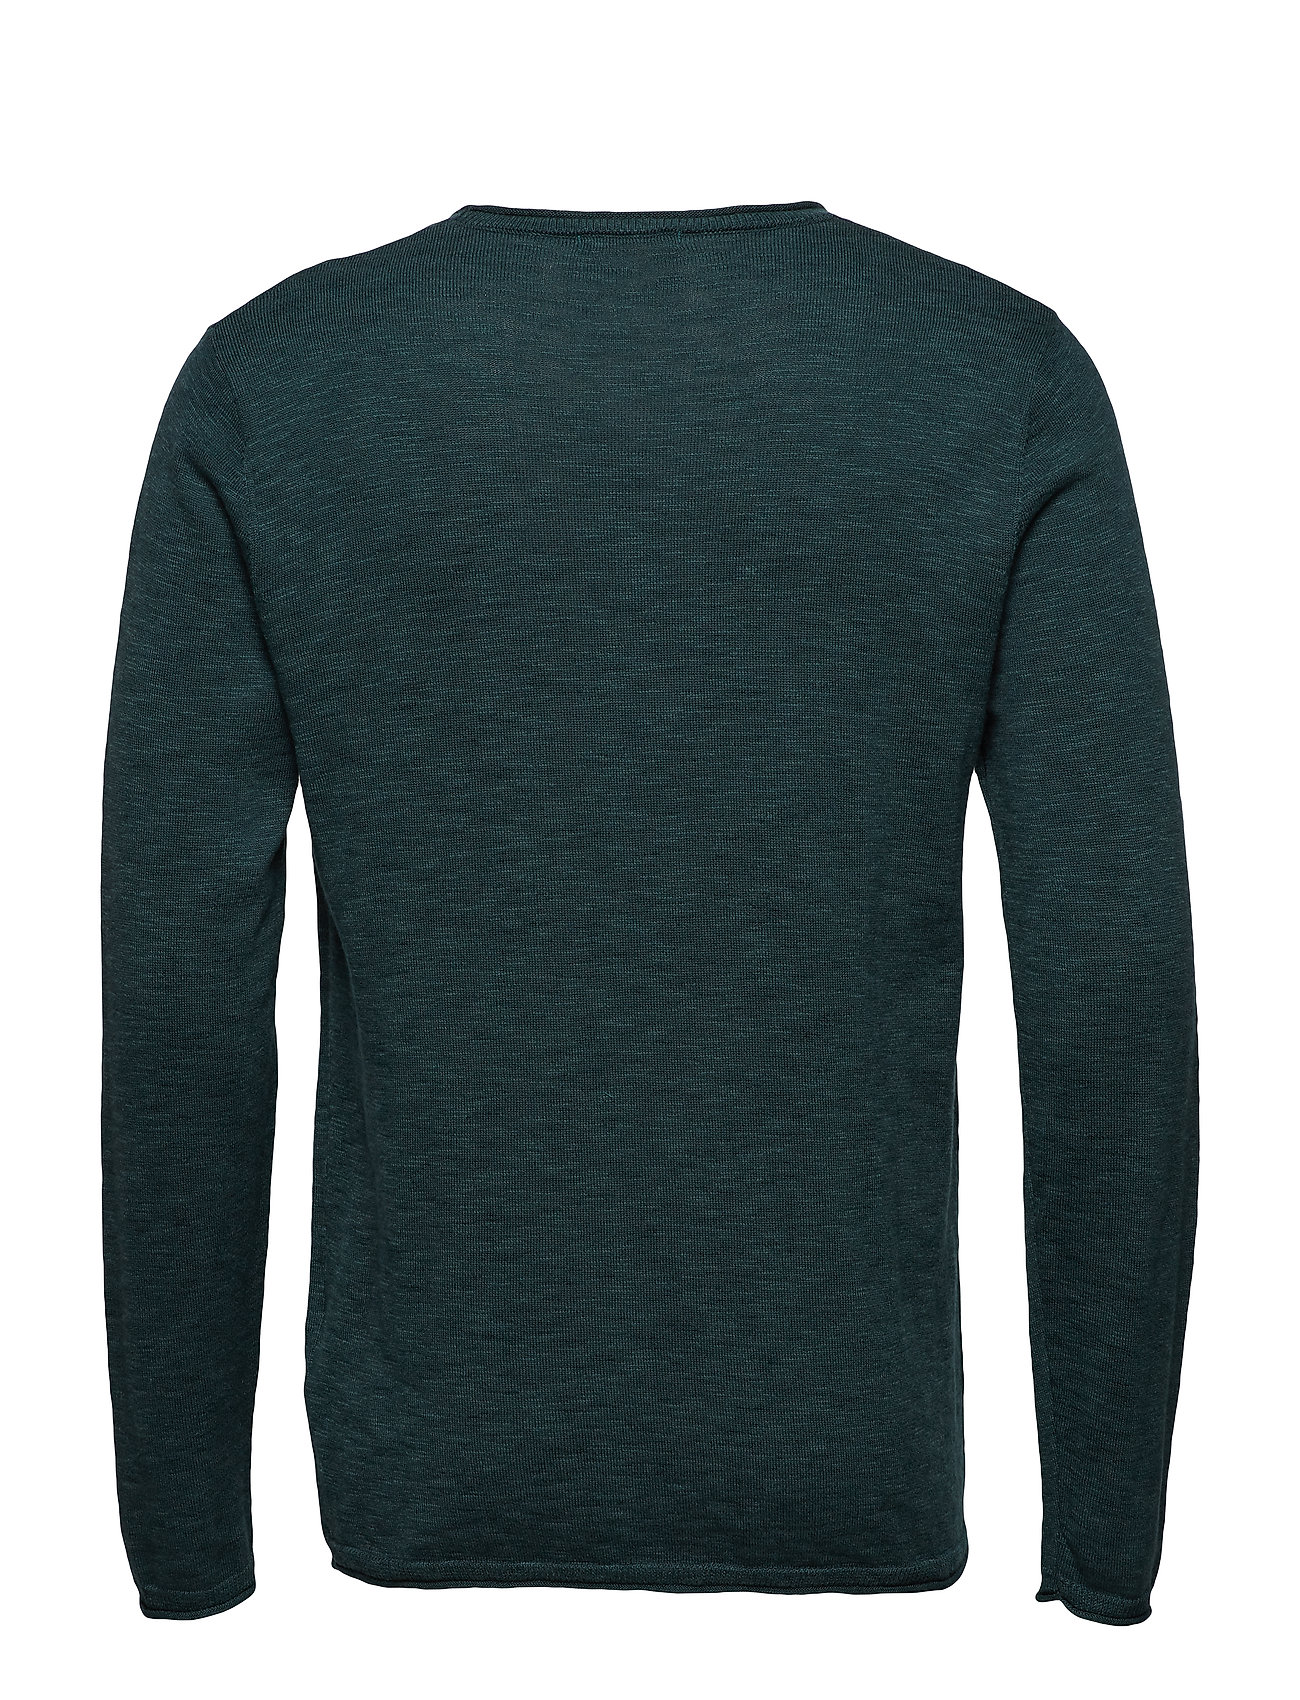 Cotton Apparel Knit veganbistro Single GreenKnowledge With Edge Rool WIDH29E